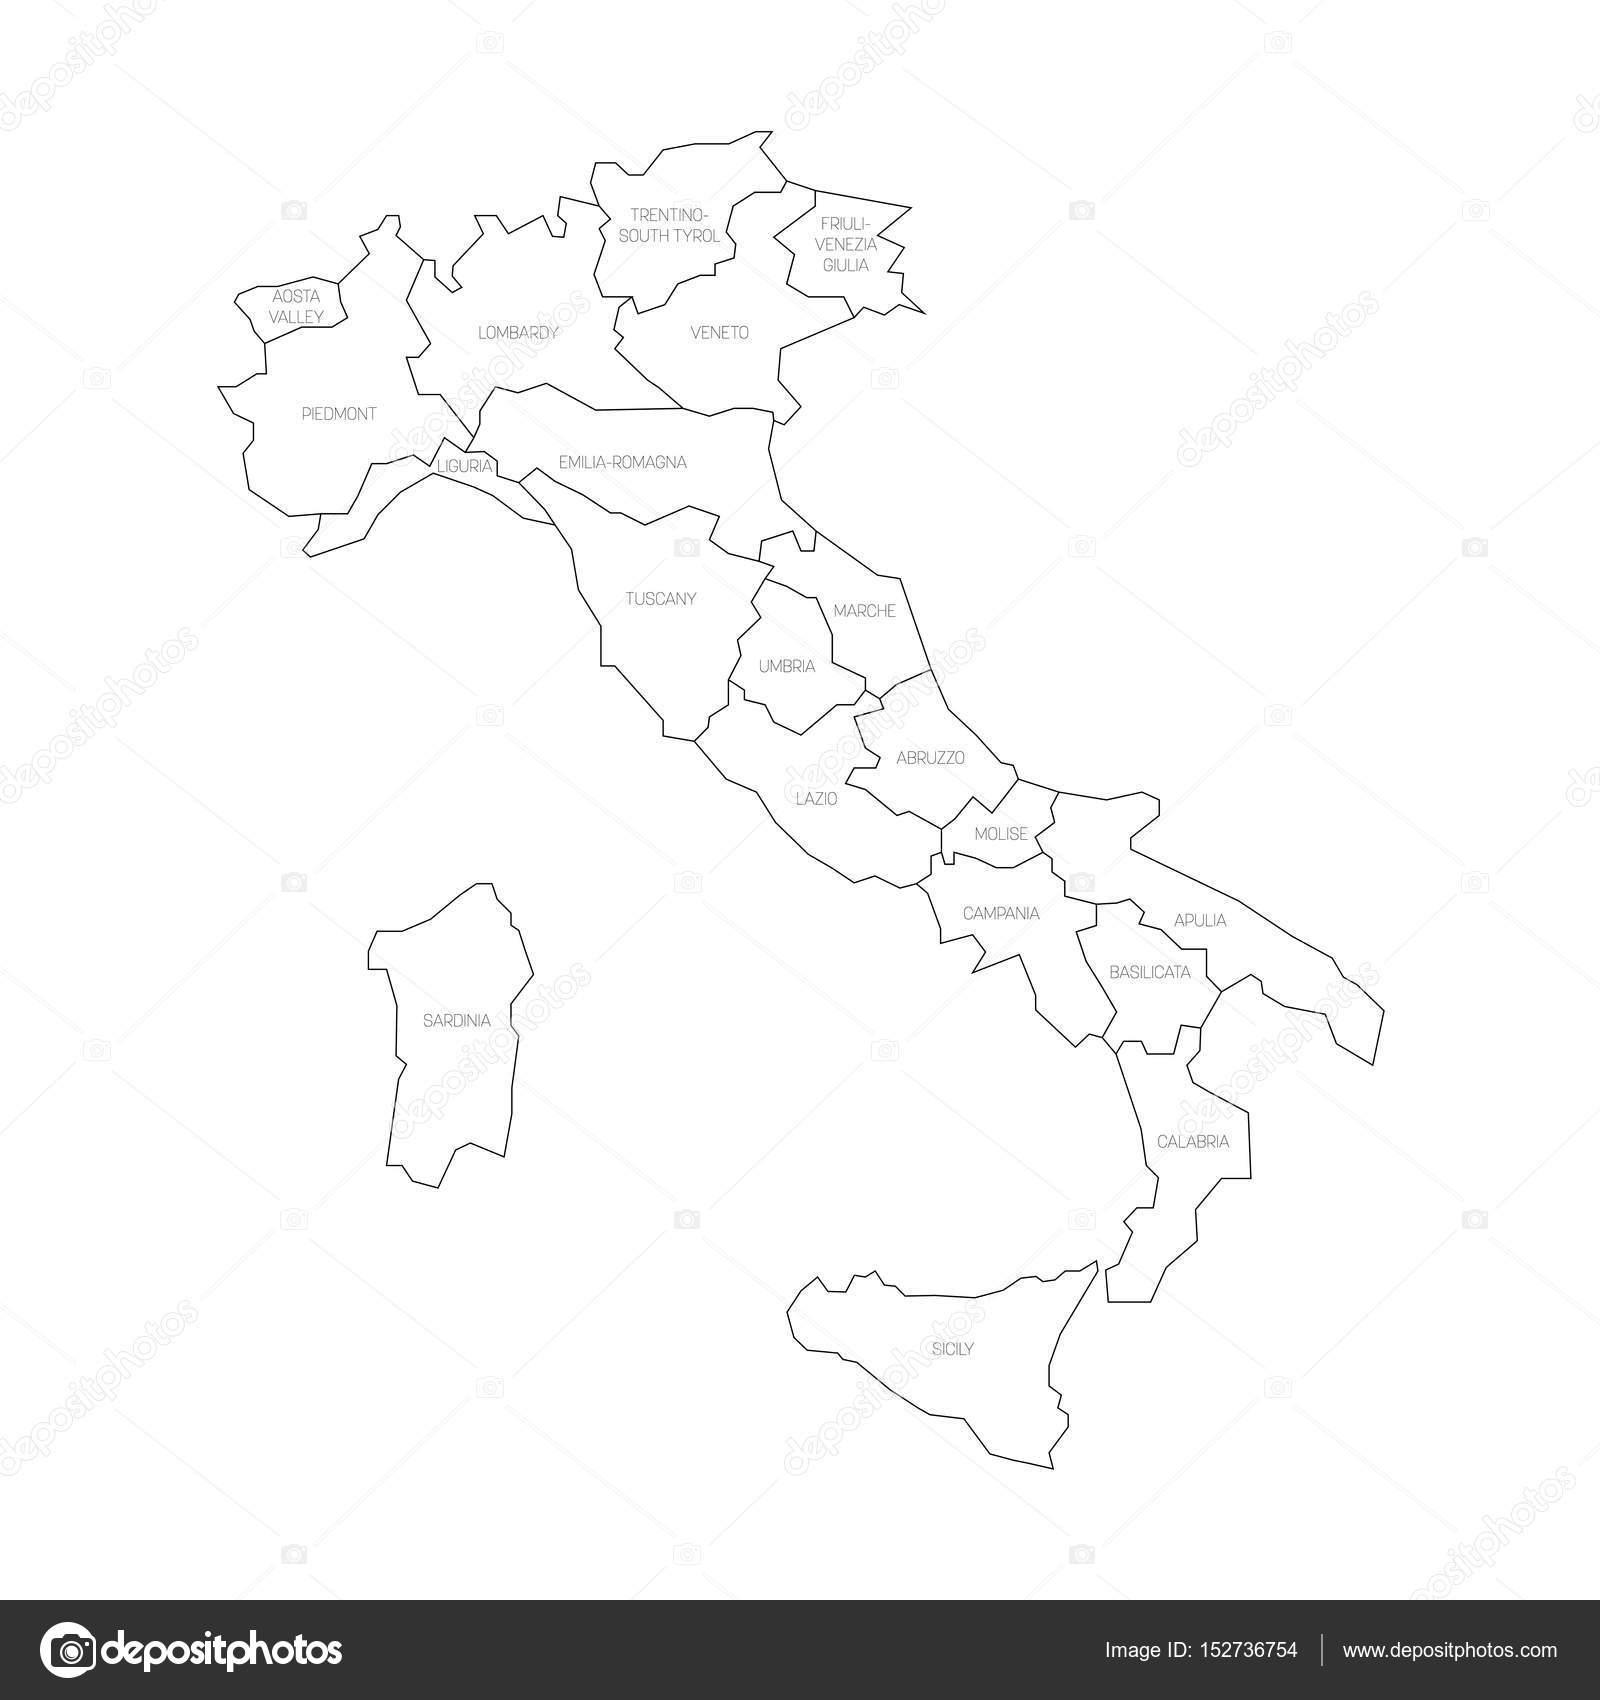 Cartina Italia Regioni Bianco E Nero.ᐈ Sagoma Italia Con Regioni Vettore Di Stock Fotografie Sagoma Regioni Italia Scarica Su Depositphotos